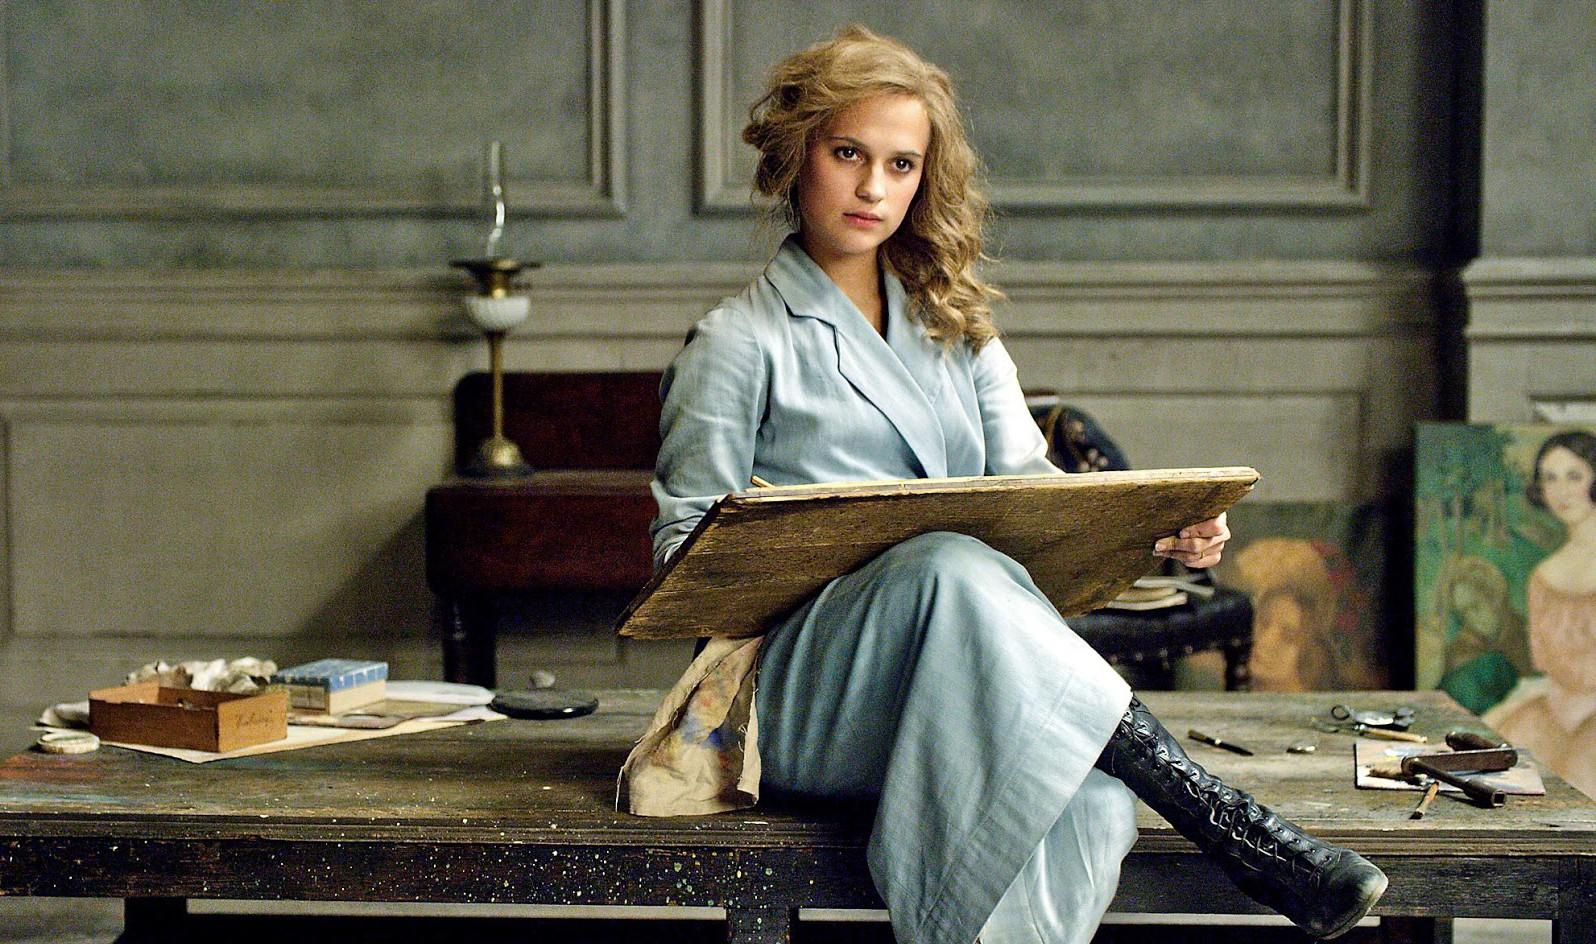 Alicia Vikander in The Danish Girl, directed by Tom Hooper.